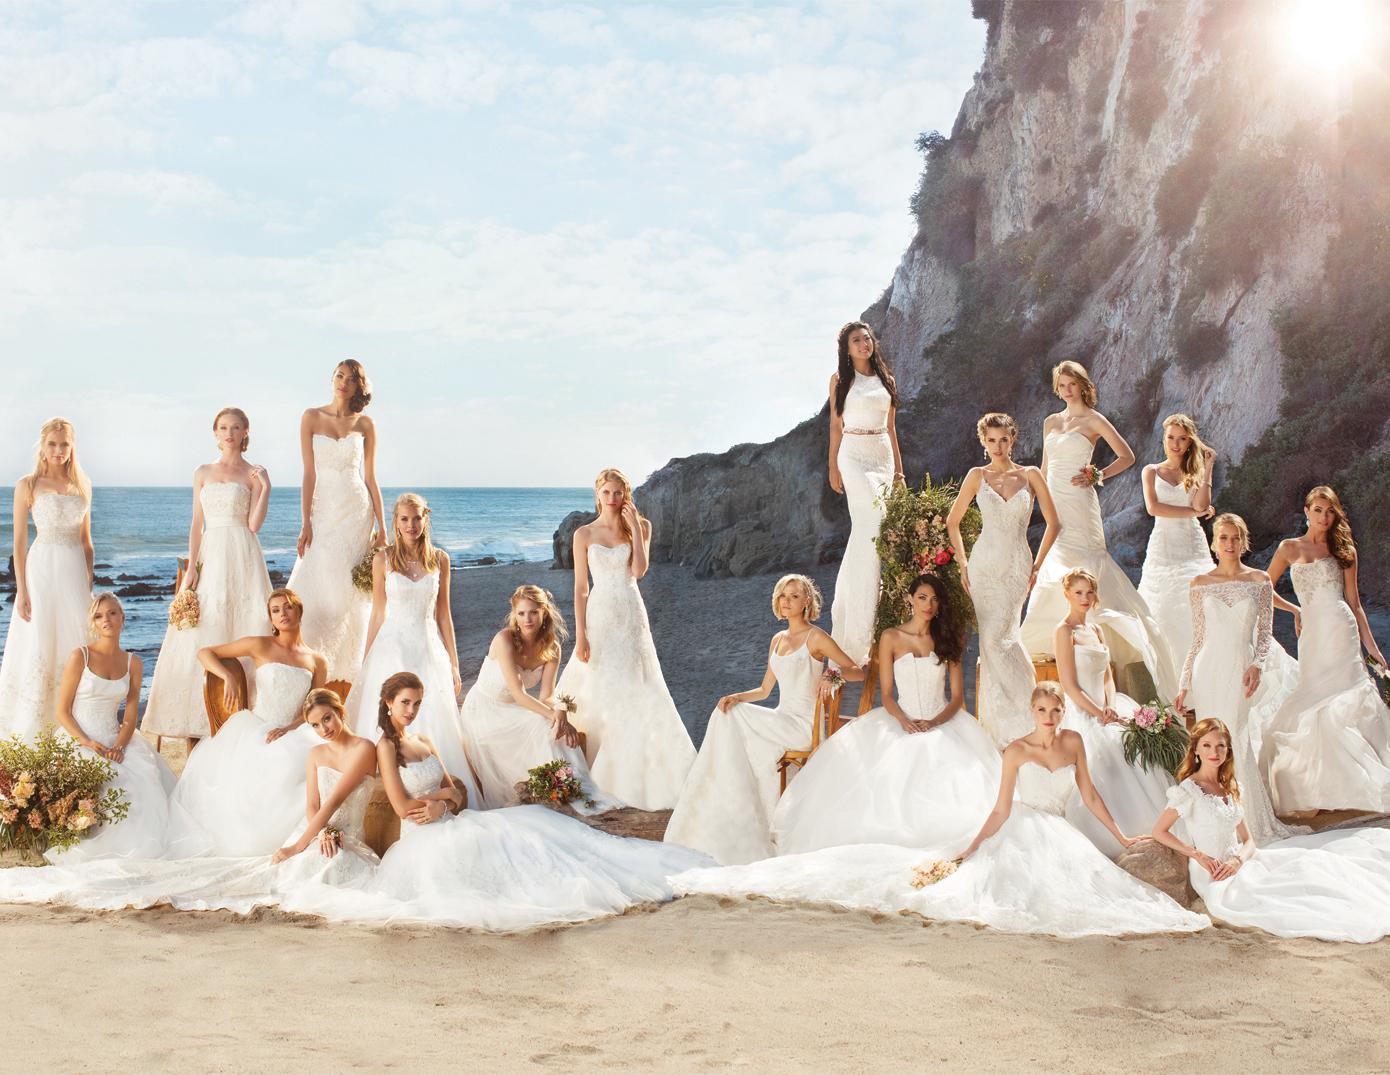 Casablanca bridal celebrates years of creating wedding dresses